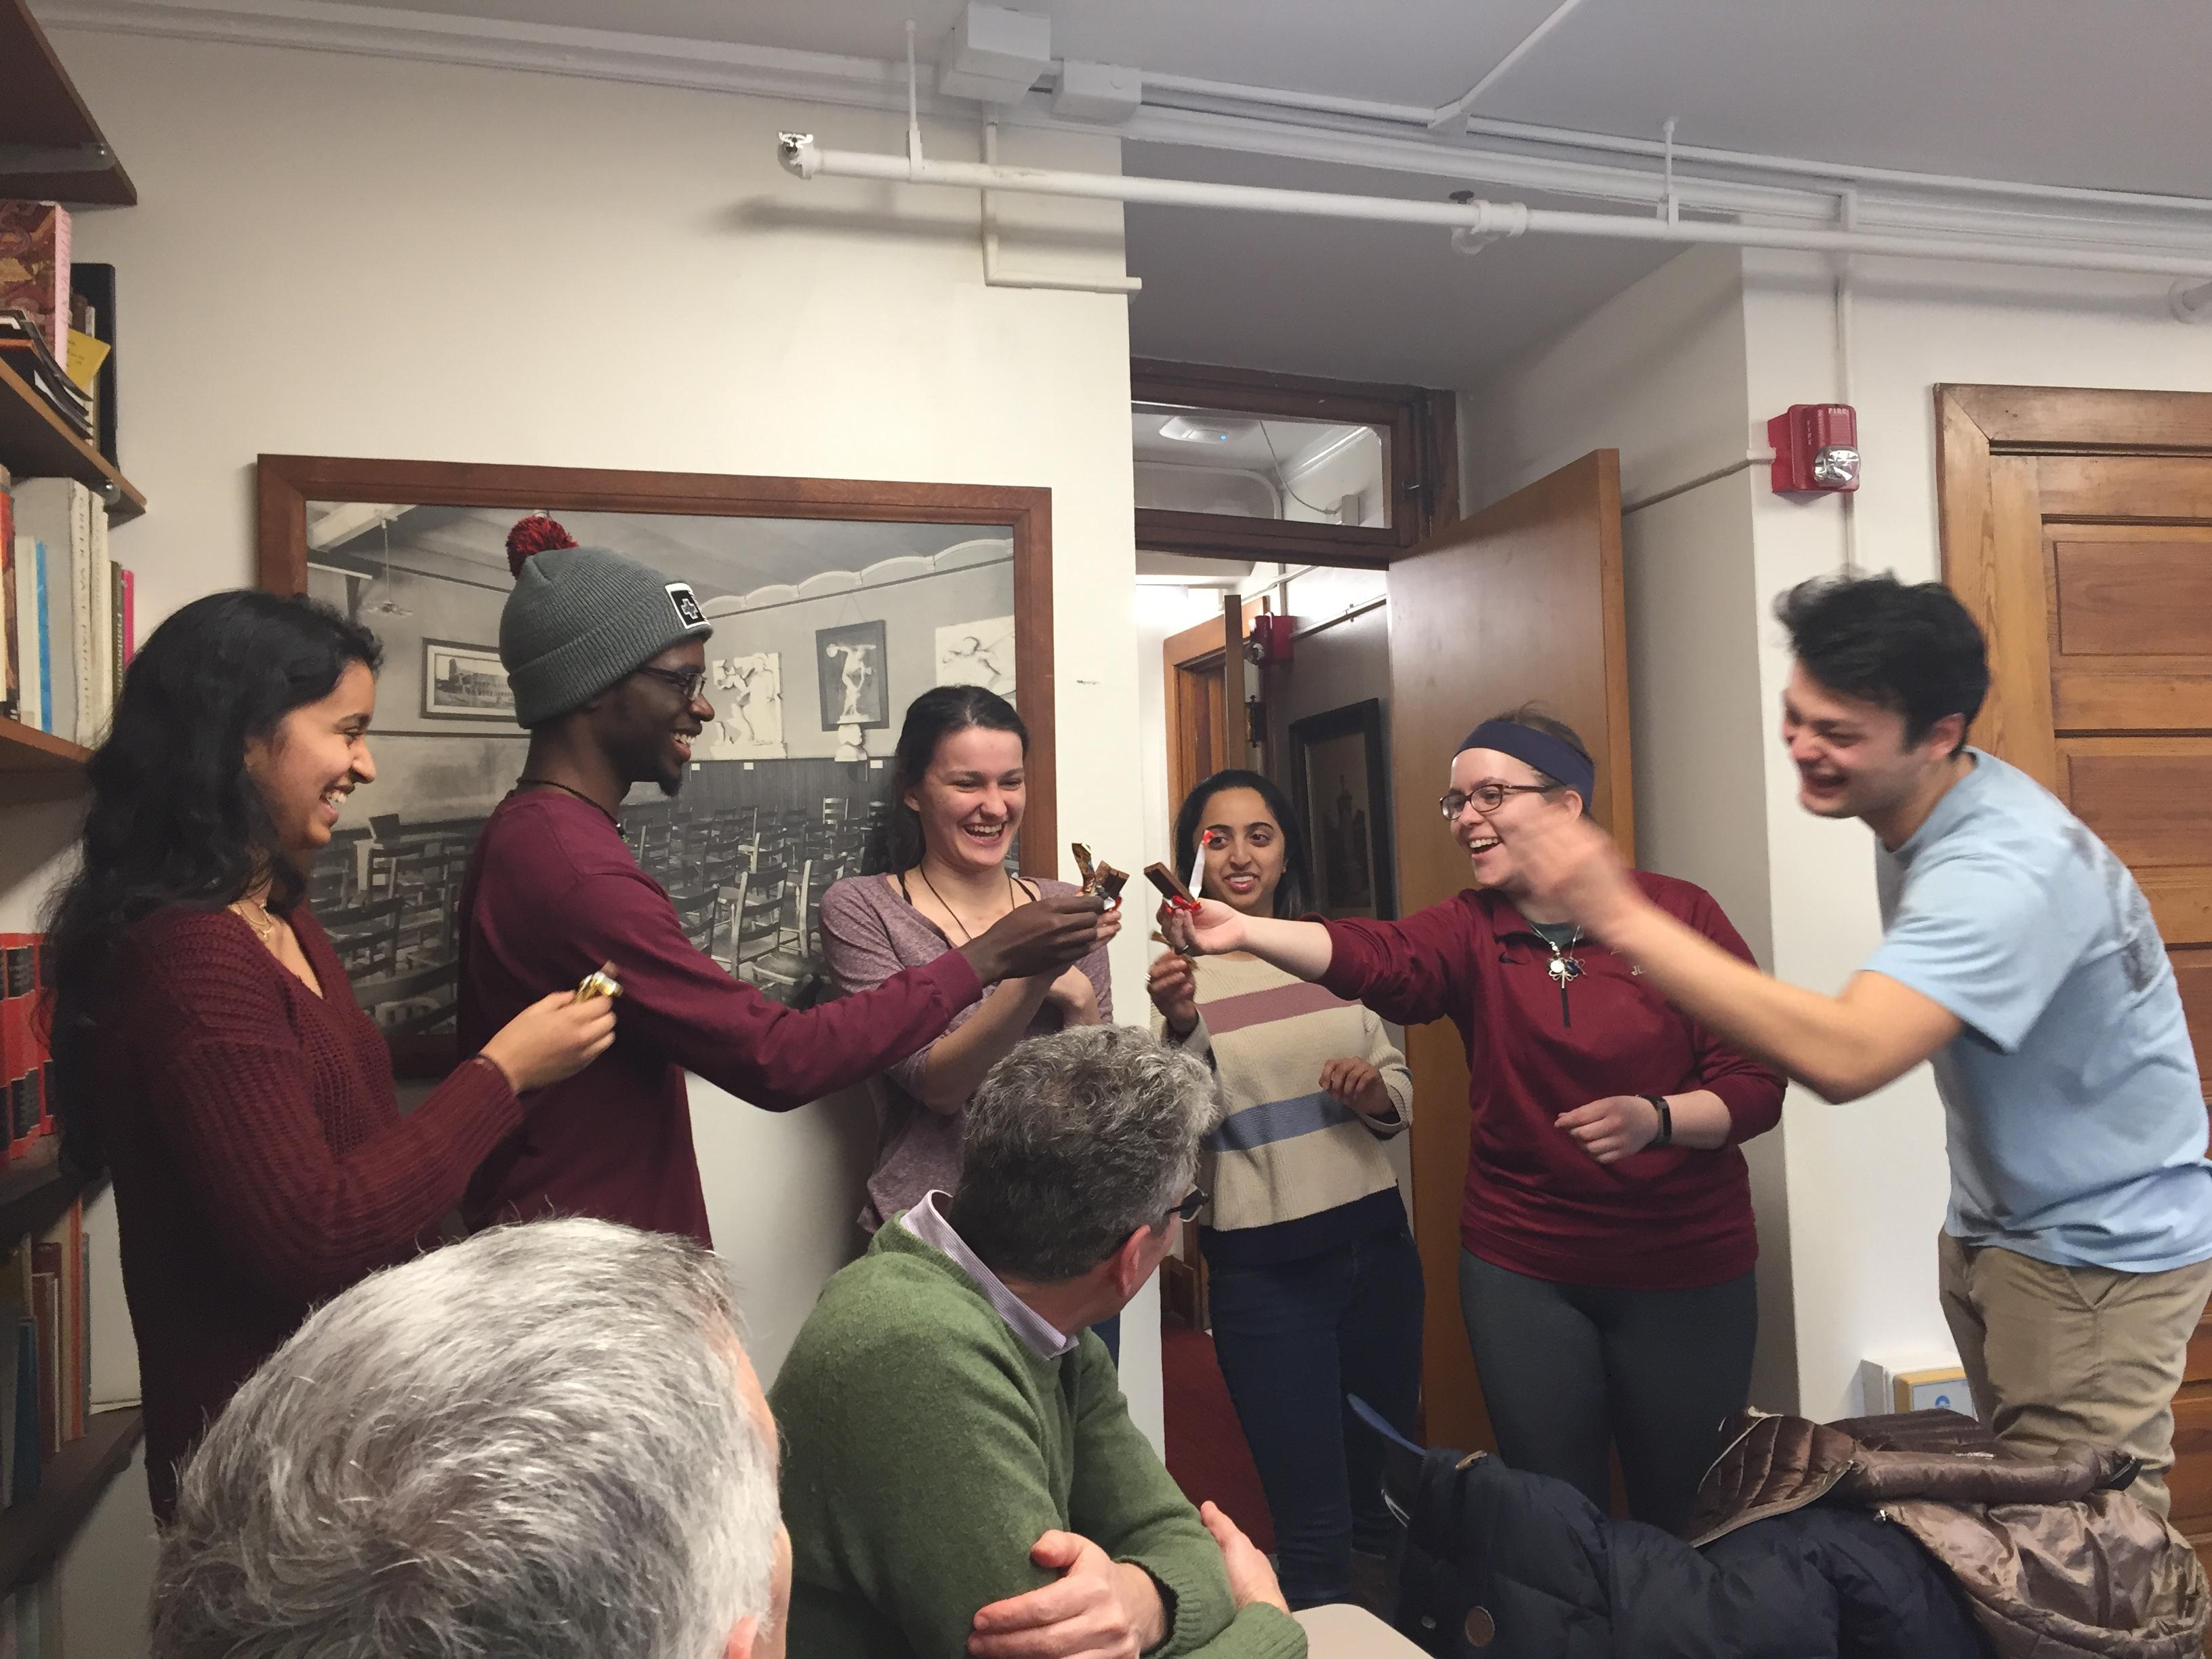 New members of Eta Sigma Phi celebrate with a candy toast (from L to R: Asha Ravichadran, Nana Yorke, Jillian White, Saloni Lad, Emma Ries, and Joshua Breckenridge).